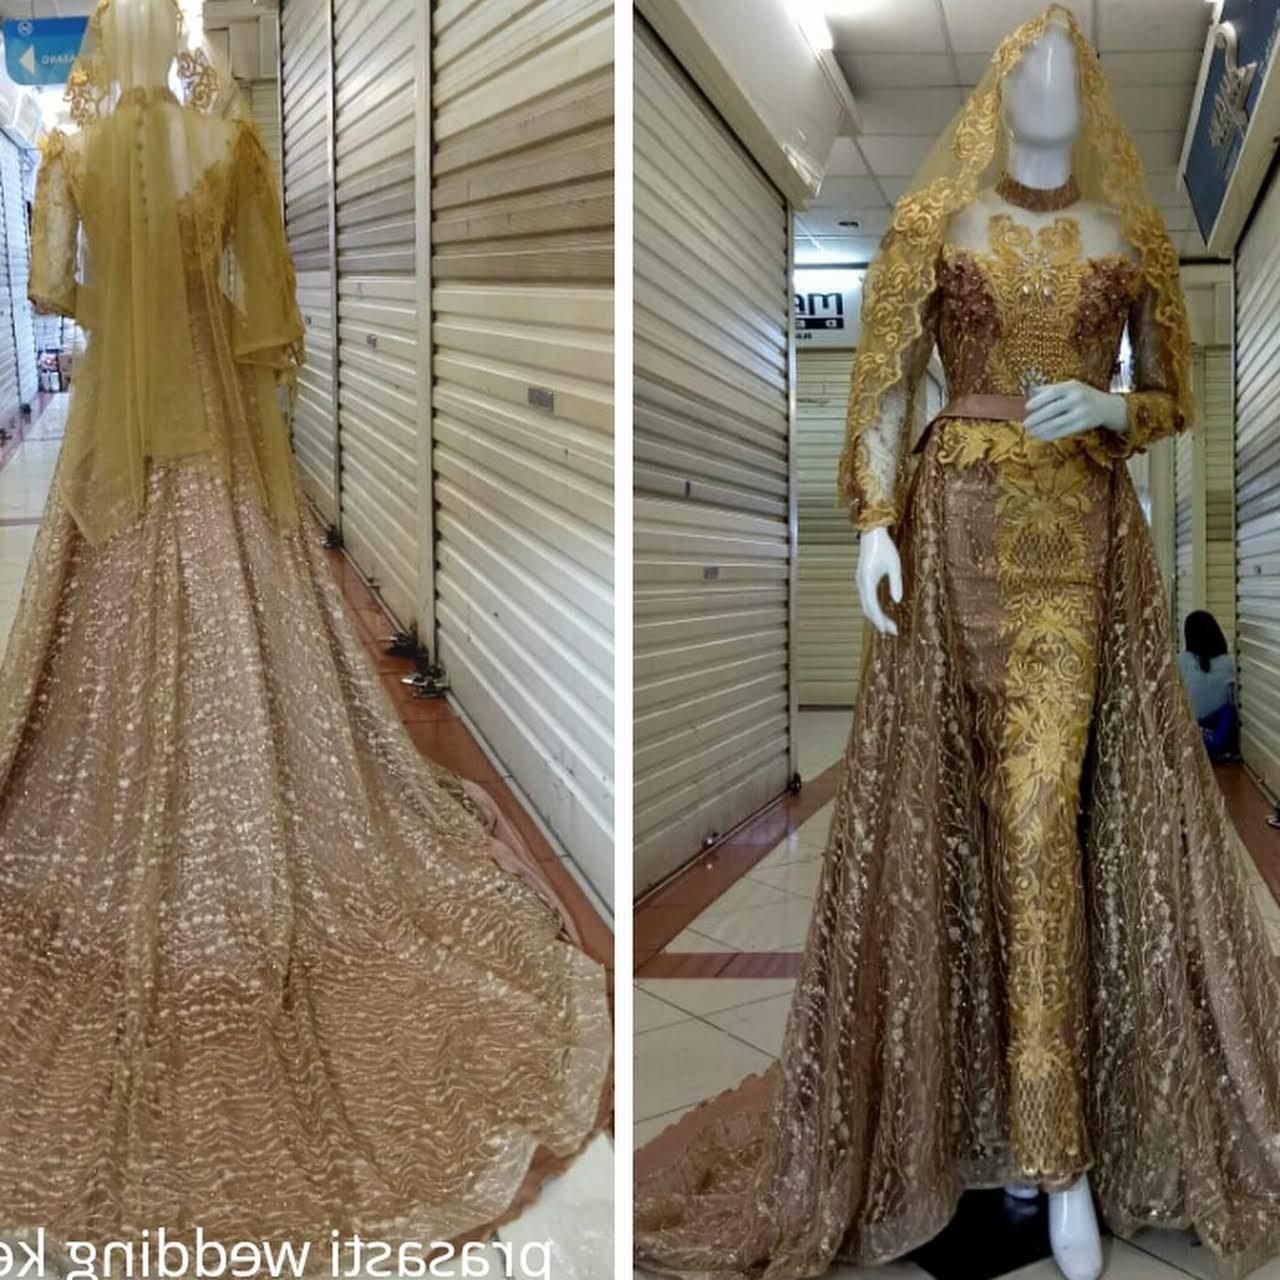 Bentuk Sewa Baju Pengantin Muslimah Nkde Gaun Kebaya Pengantin Muslimah Hijab Syari Layanan Belanja